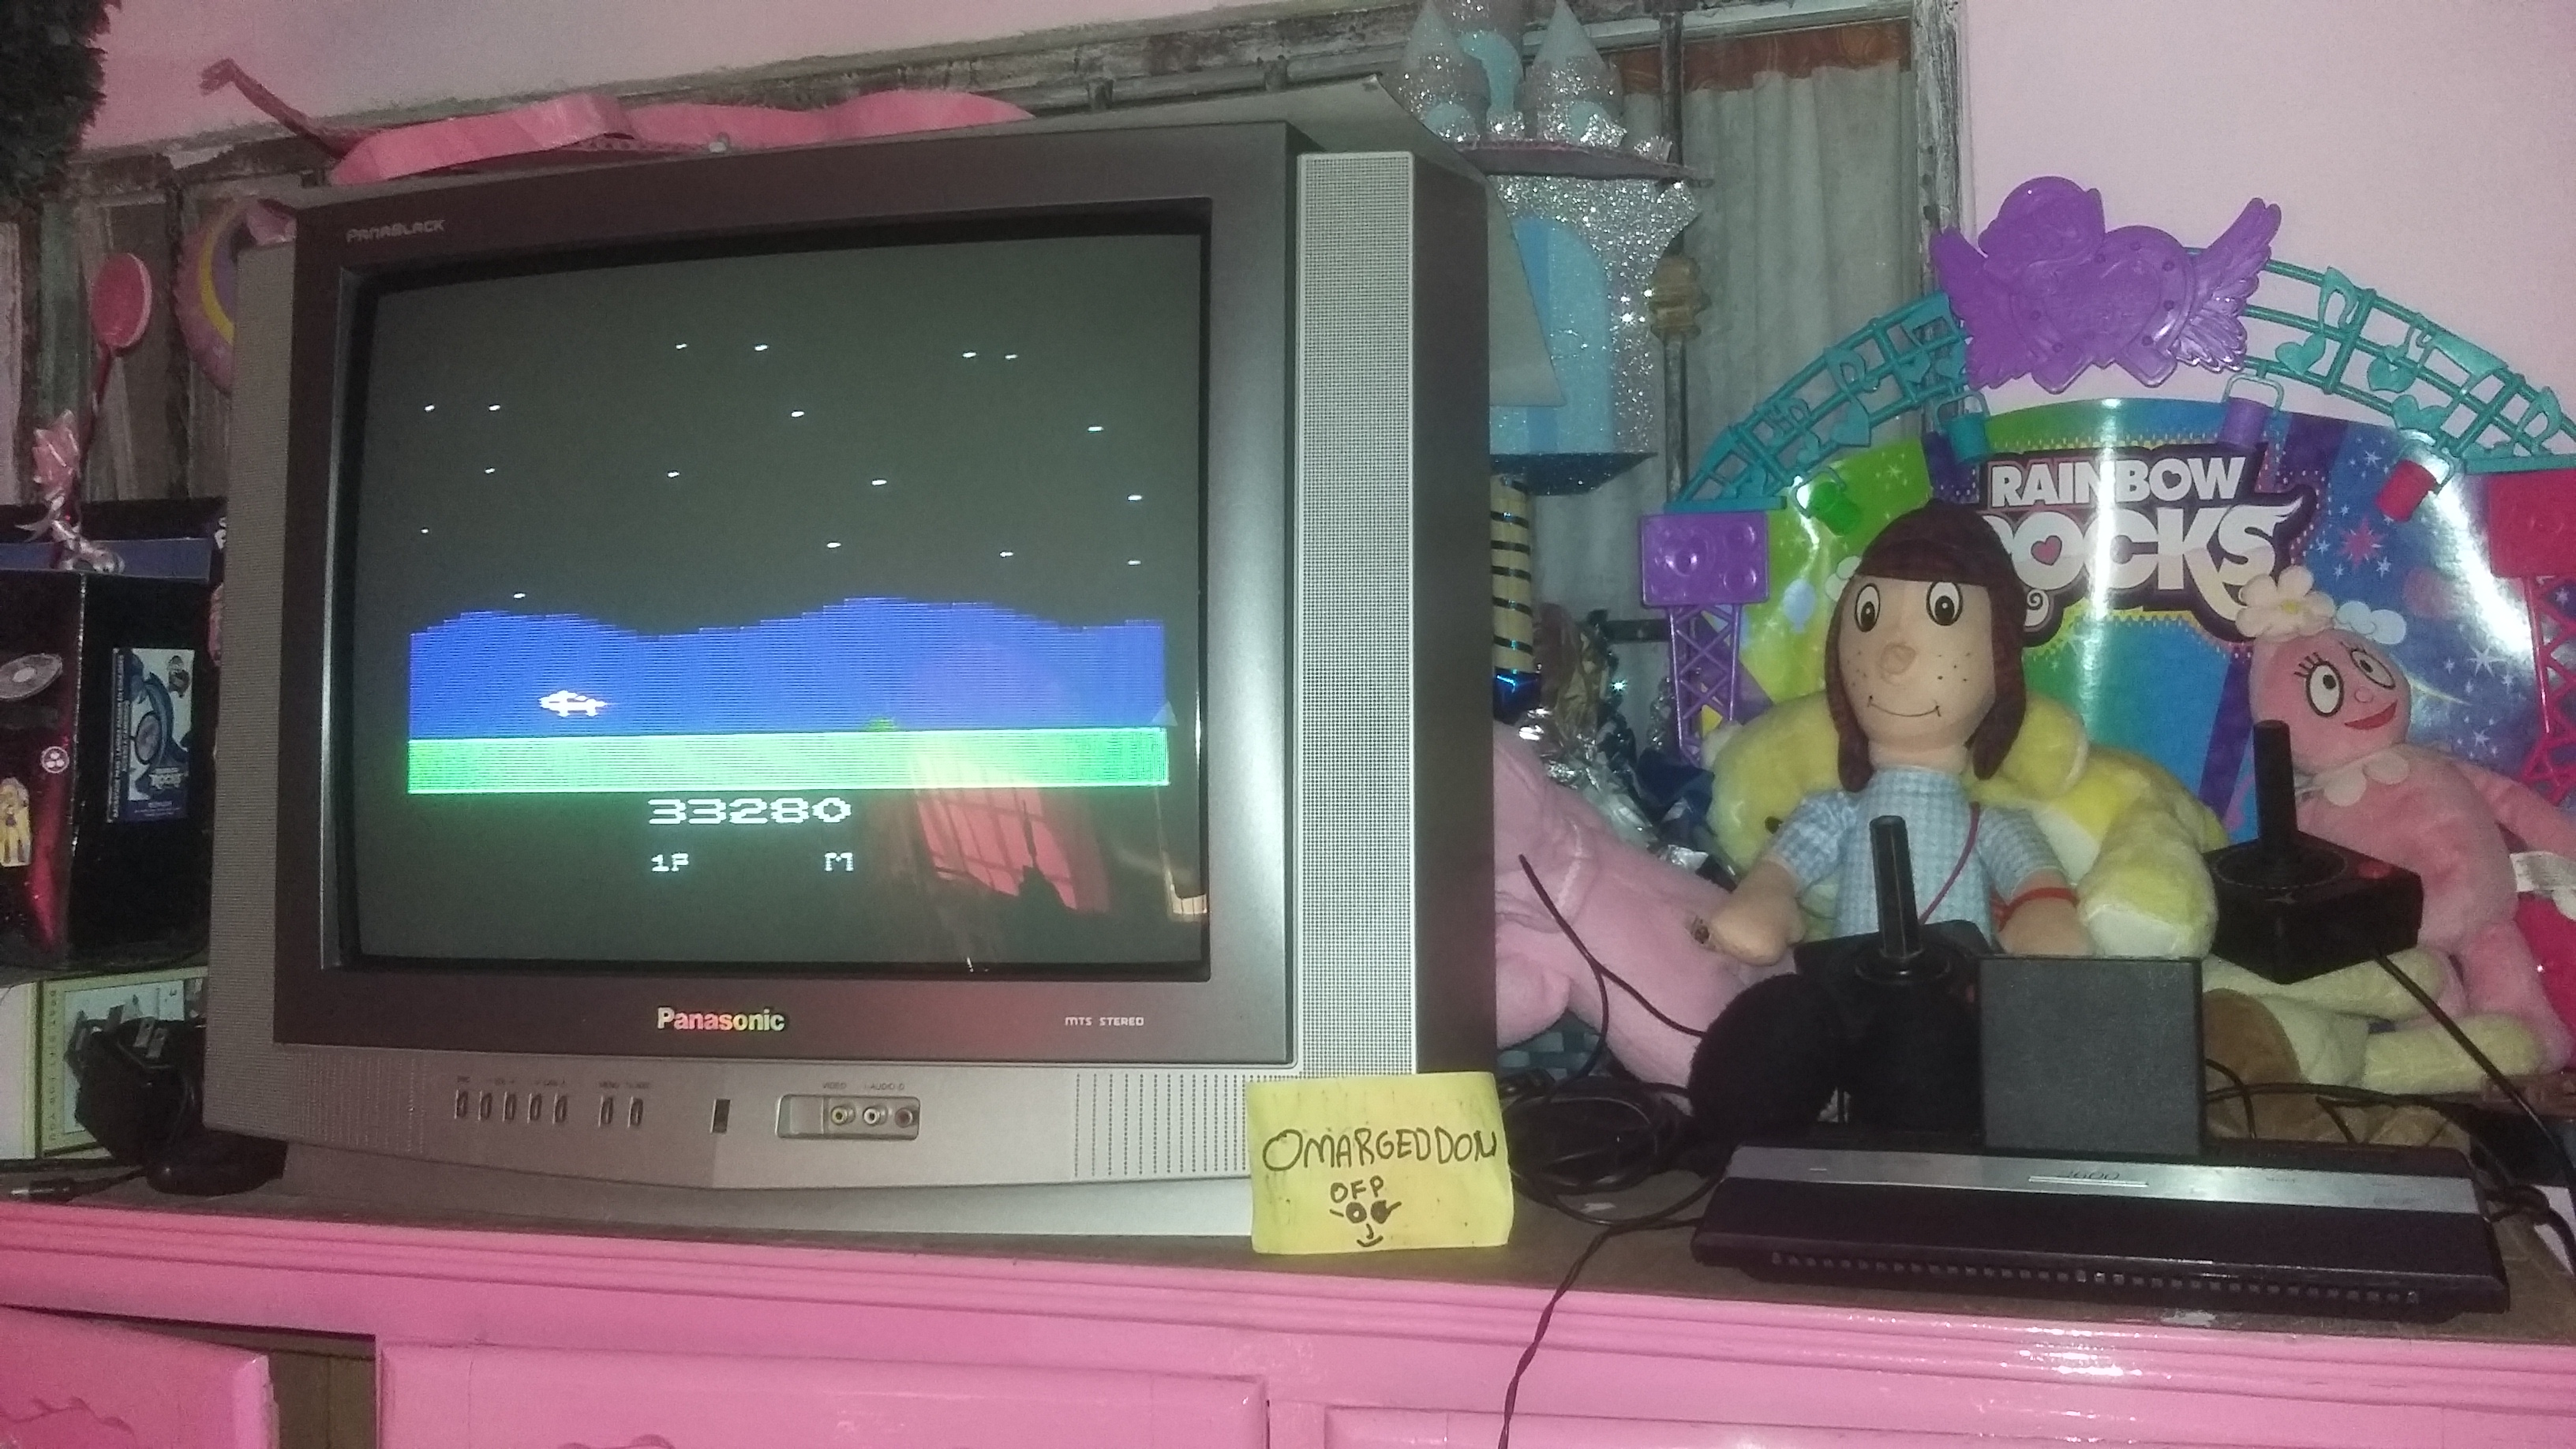 omargeddon: Moon Patrol (Atari 2600 Novice/B) 33,280 points on 2016-12-17 16:28:41